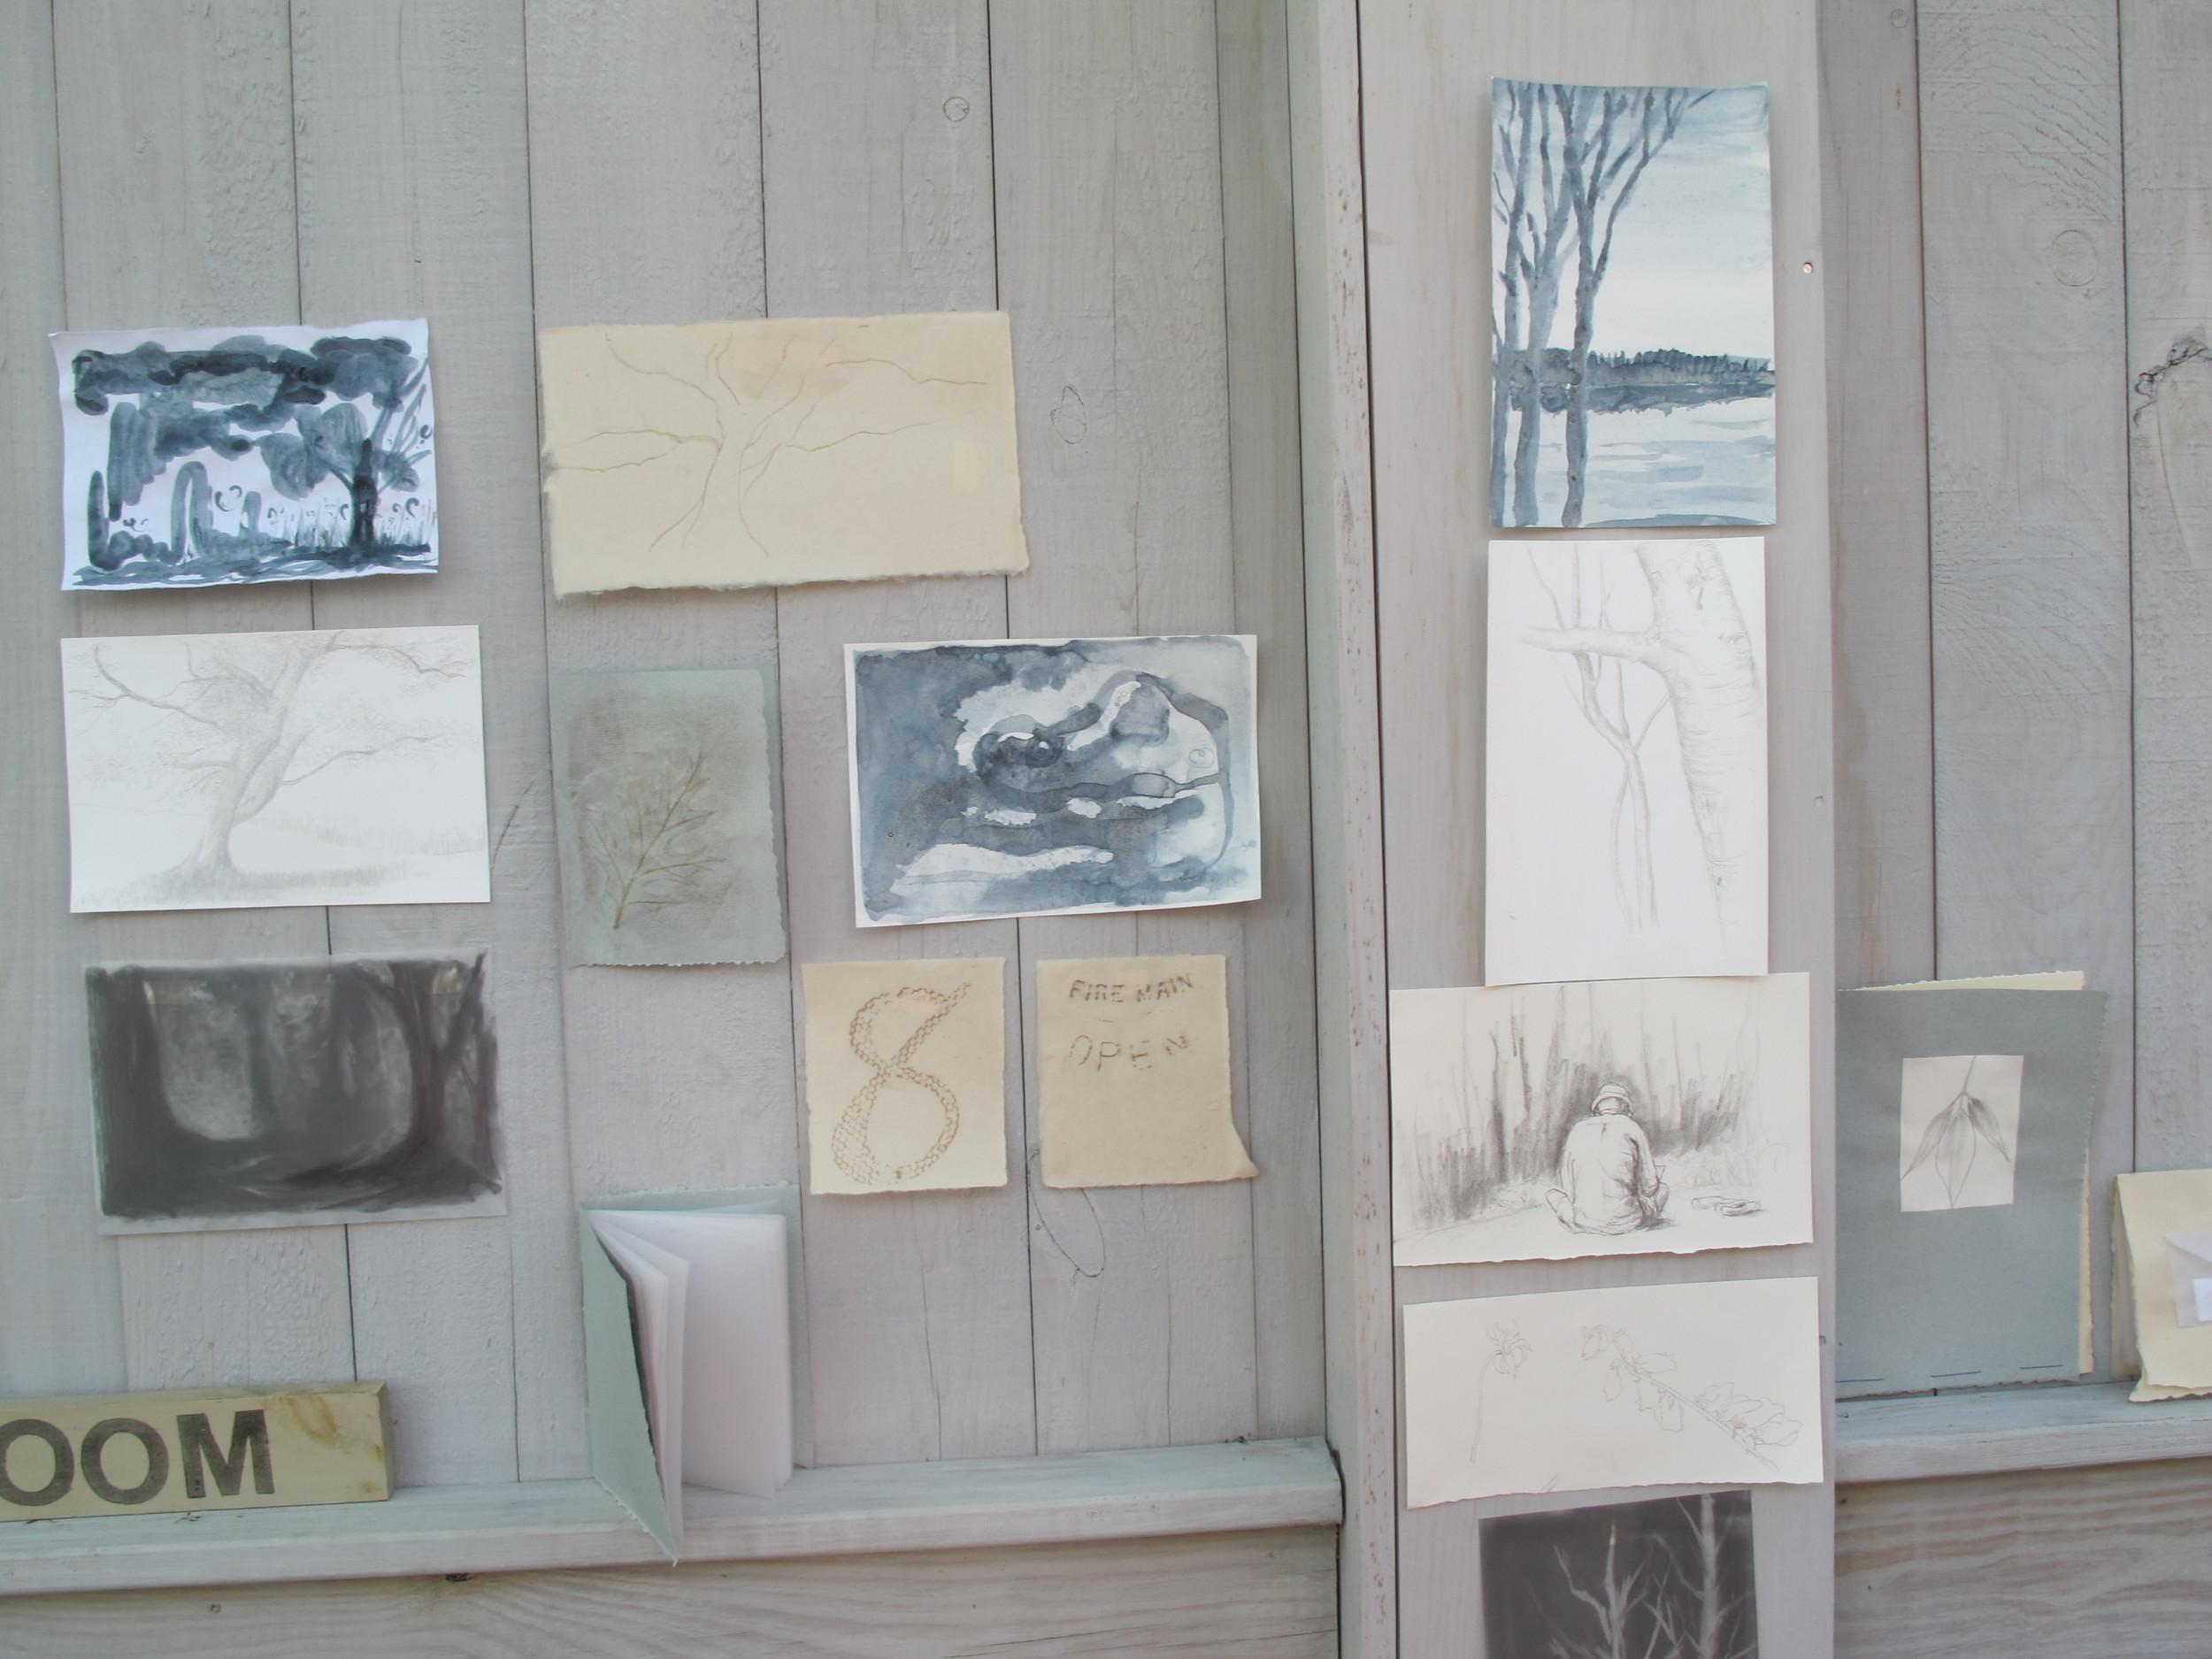 Part of the post-workshop instant art show.